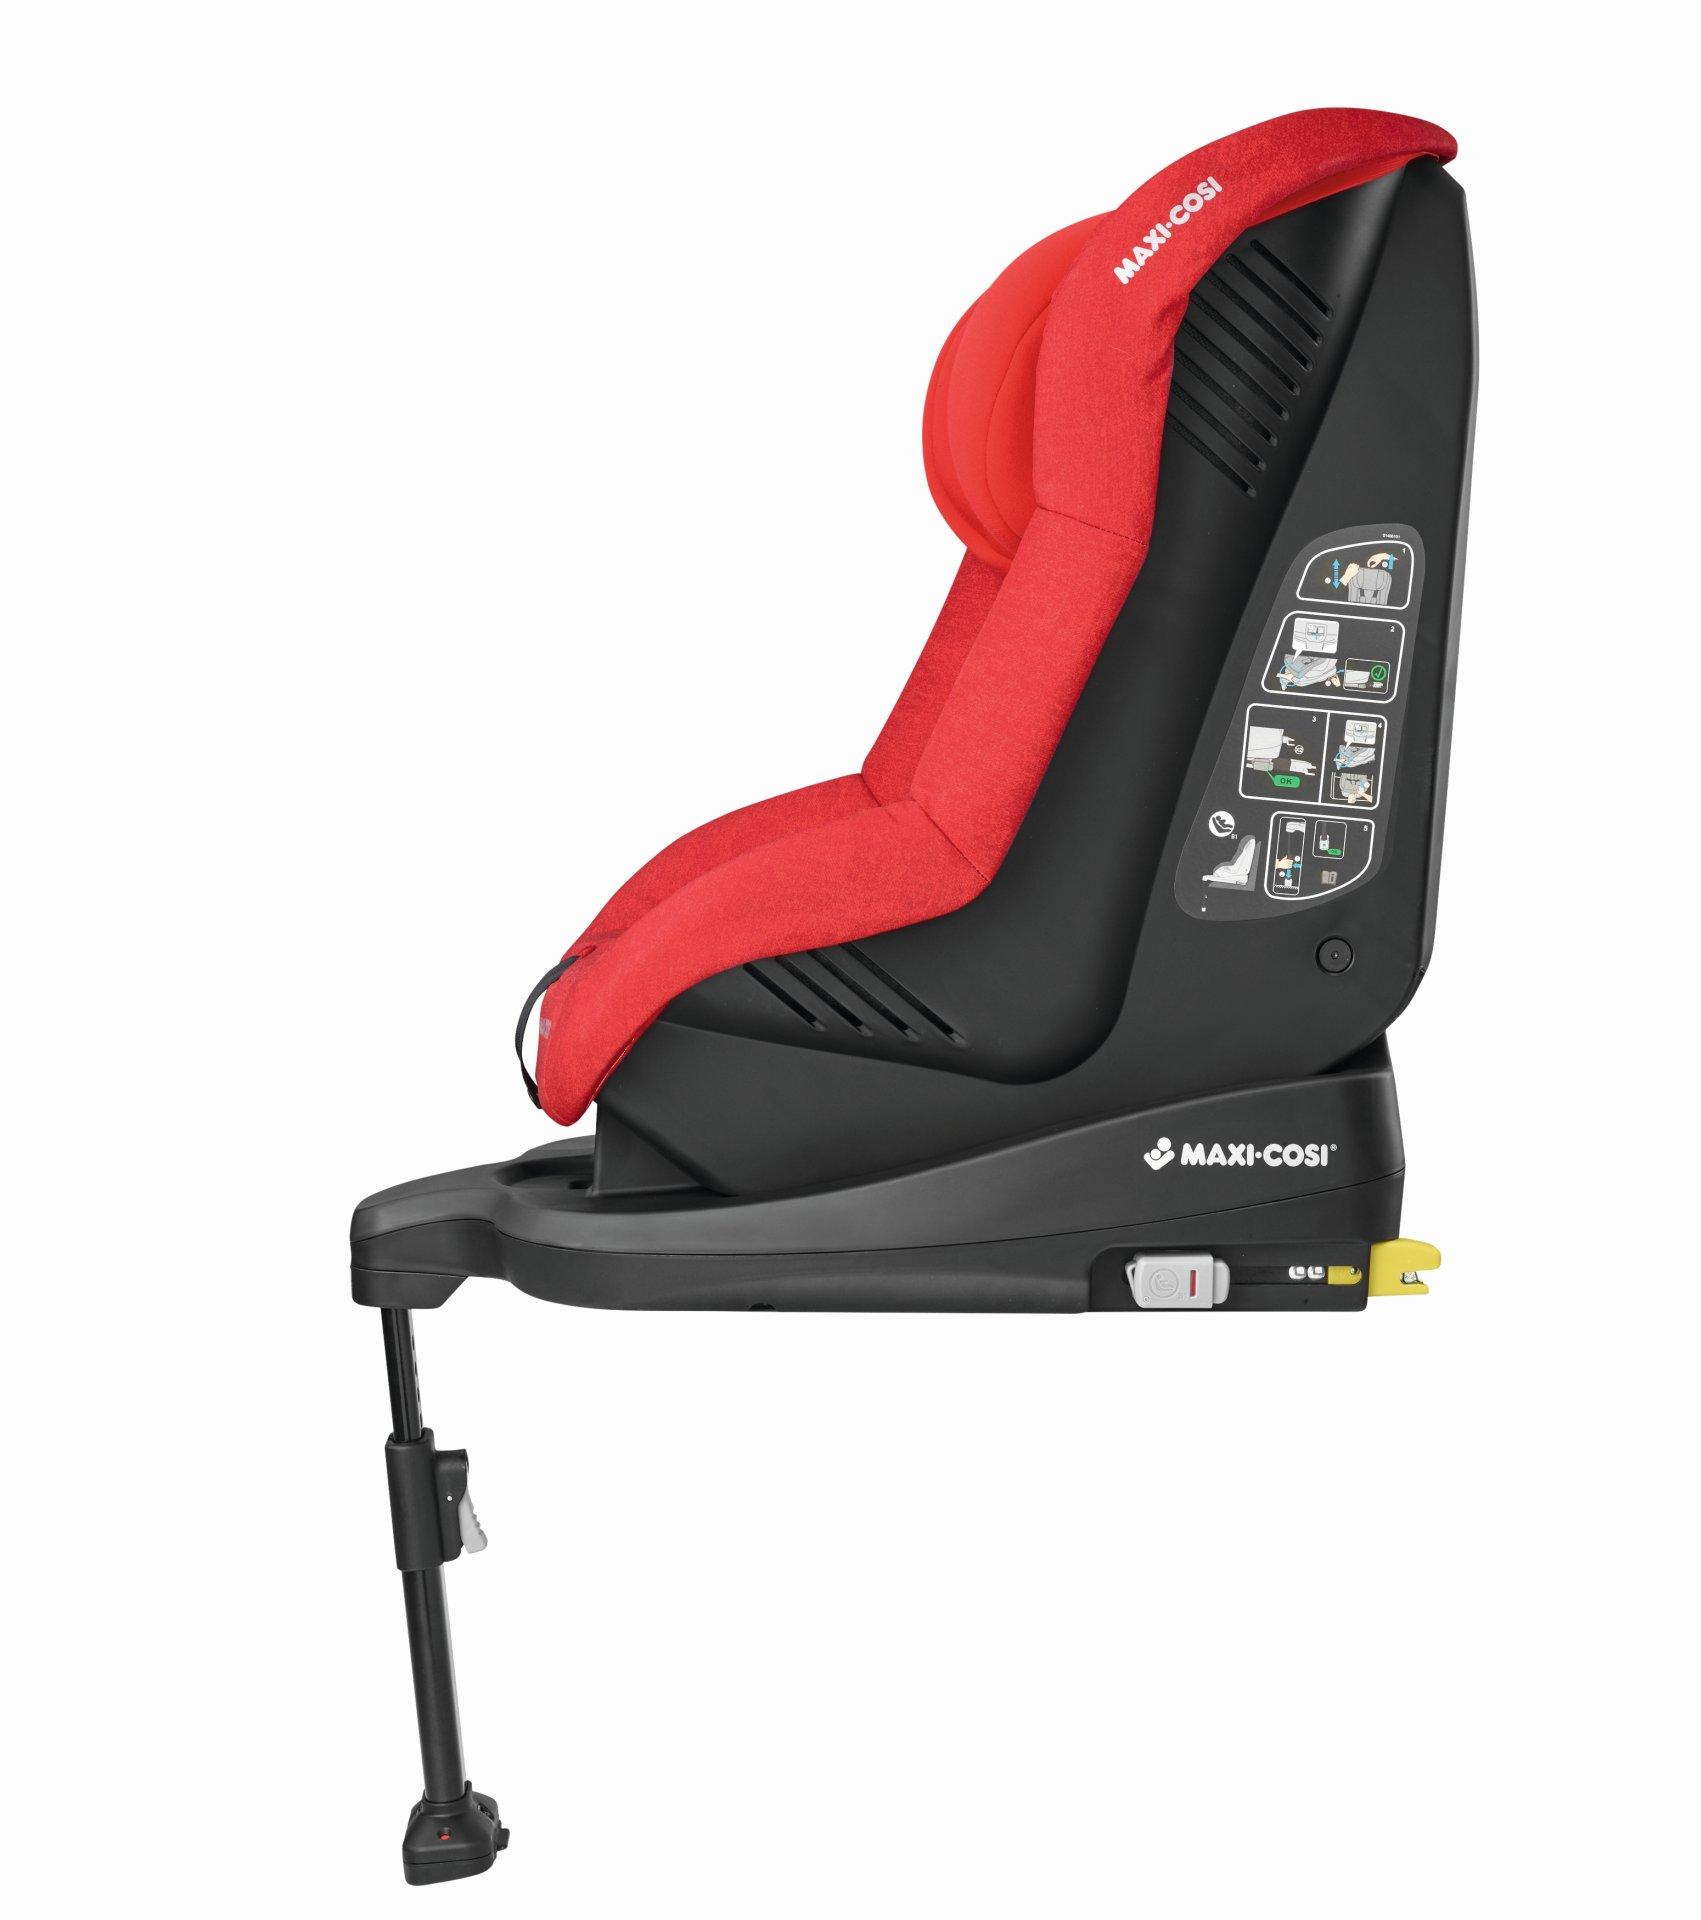 maxi cosi kindersitz tobifix 2019 nomad red online kaufen bei kidsroom kindersitze. Black Bedroom Furniture Sets. Home Design Ideas